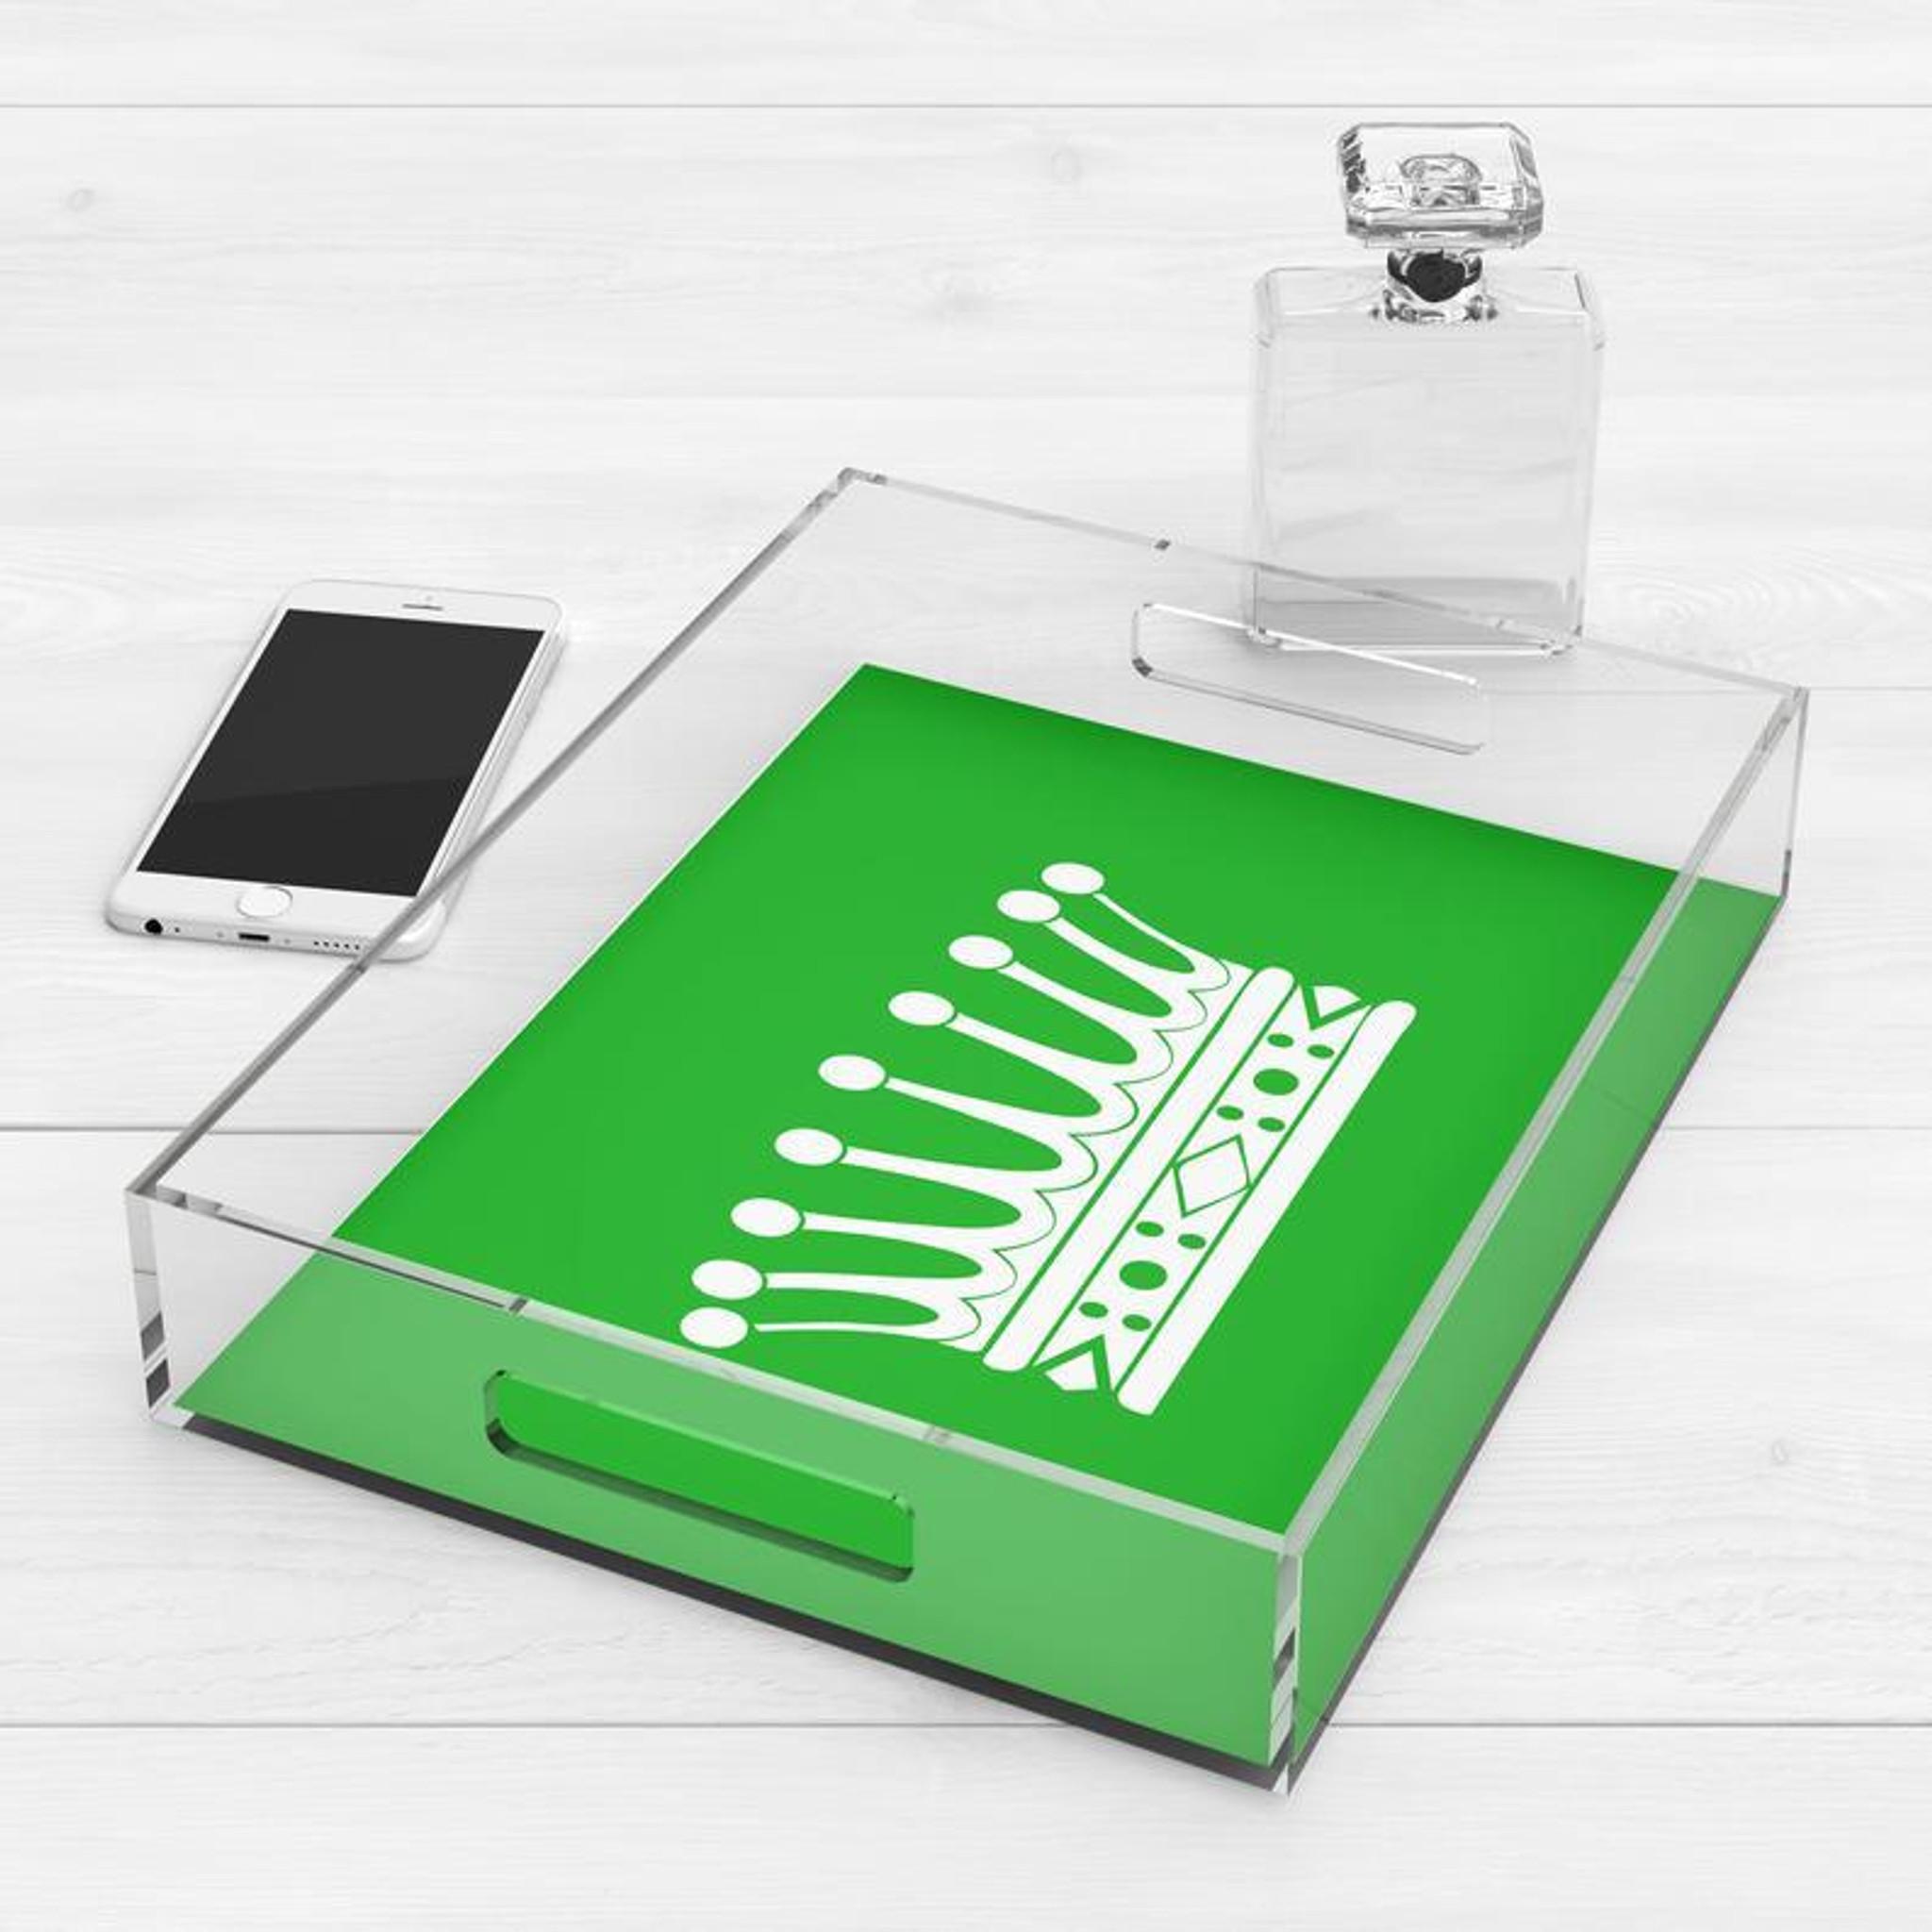 cheap acrylic tray color bright green fun kids teen decorative jewelry tray